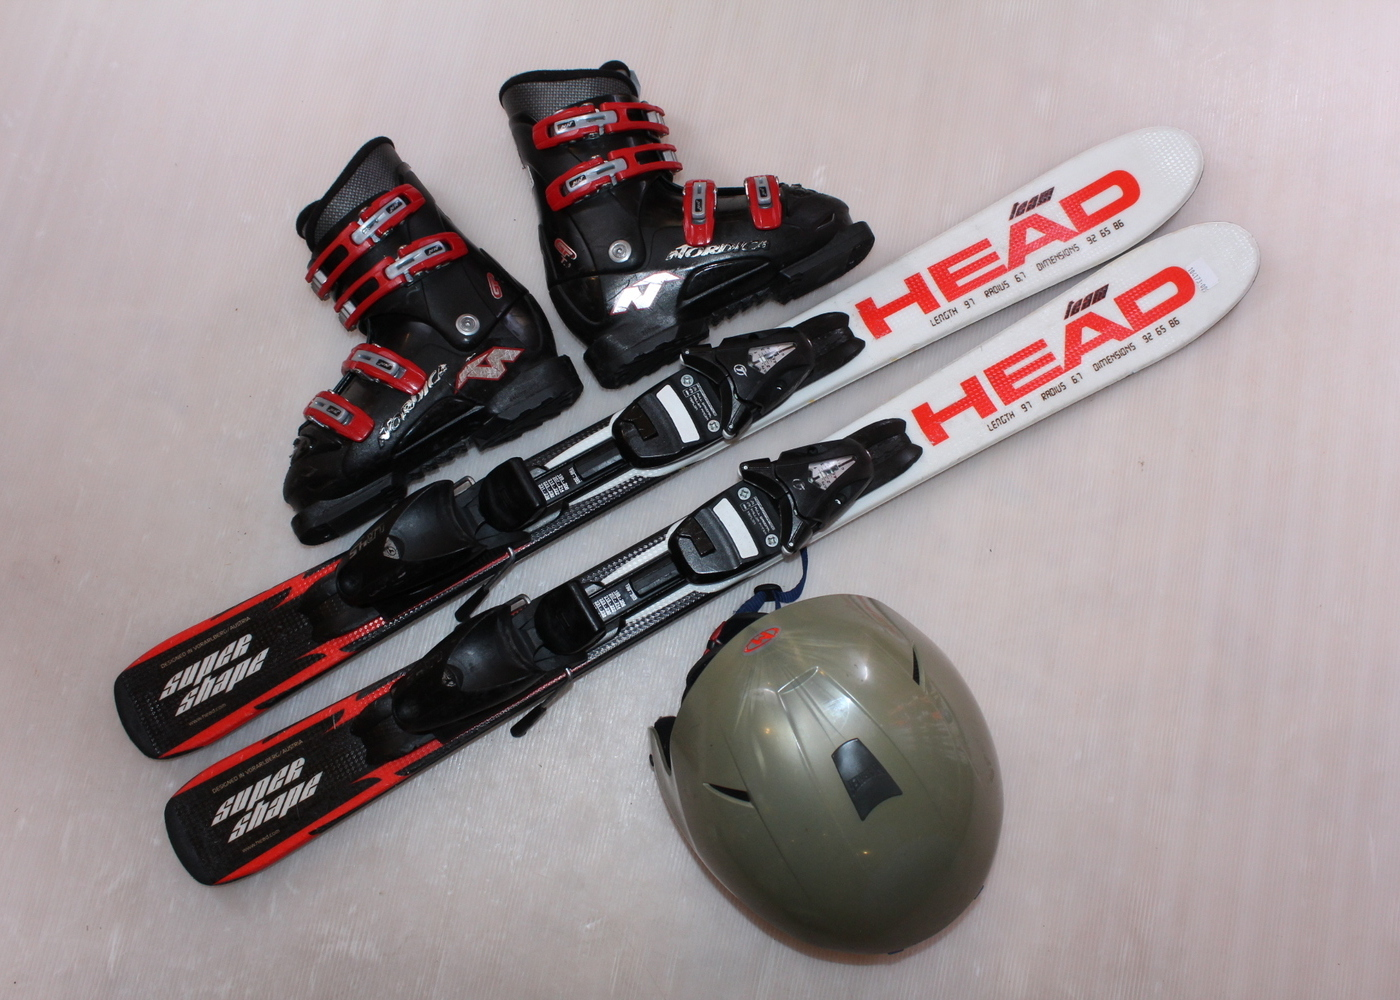 Dětské lyže HEAD SUPERSHAPE TEAM 100 cm + lyžáky  31EU + helma